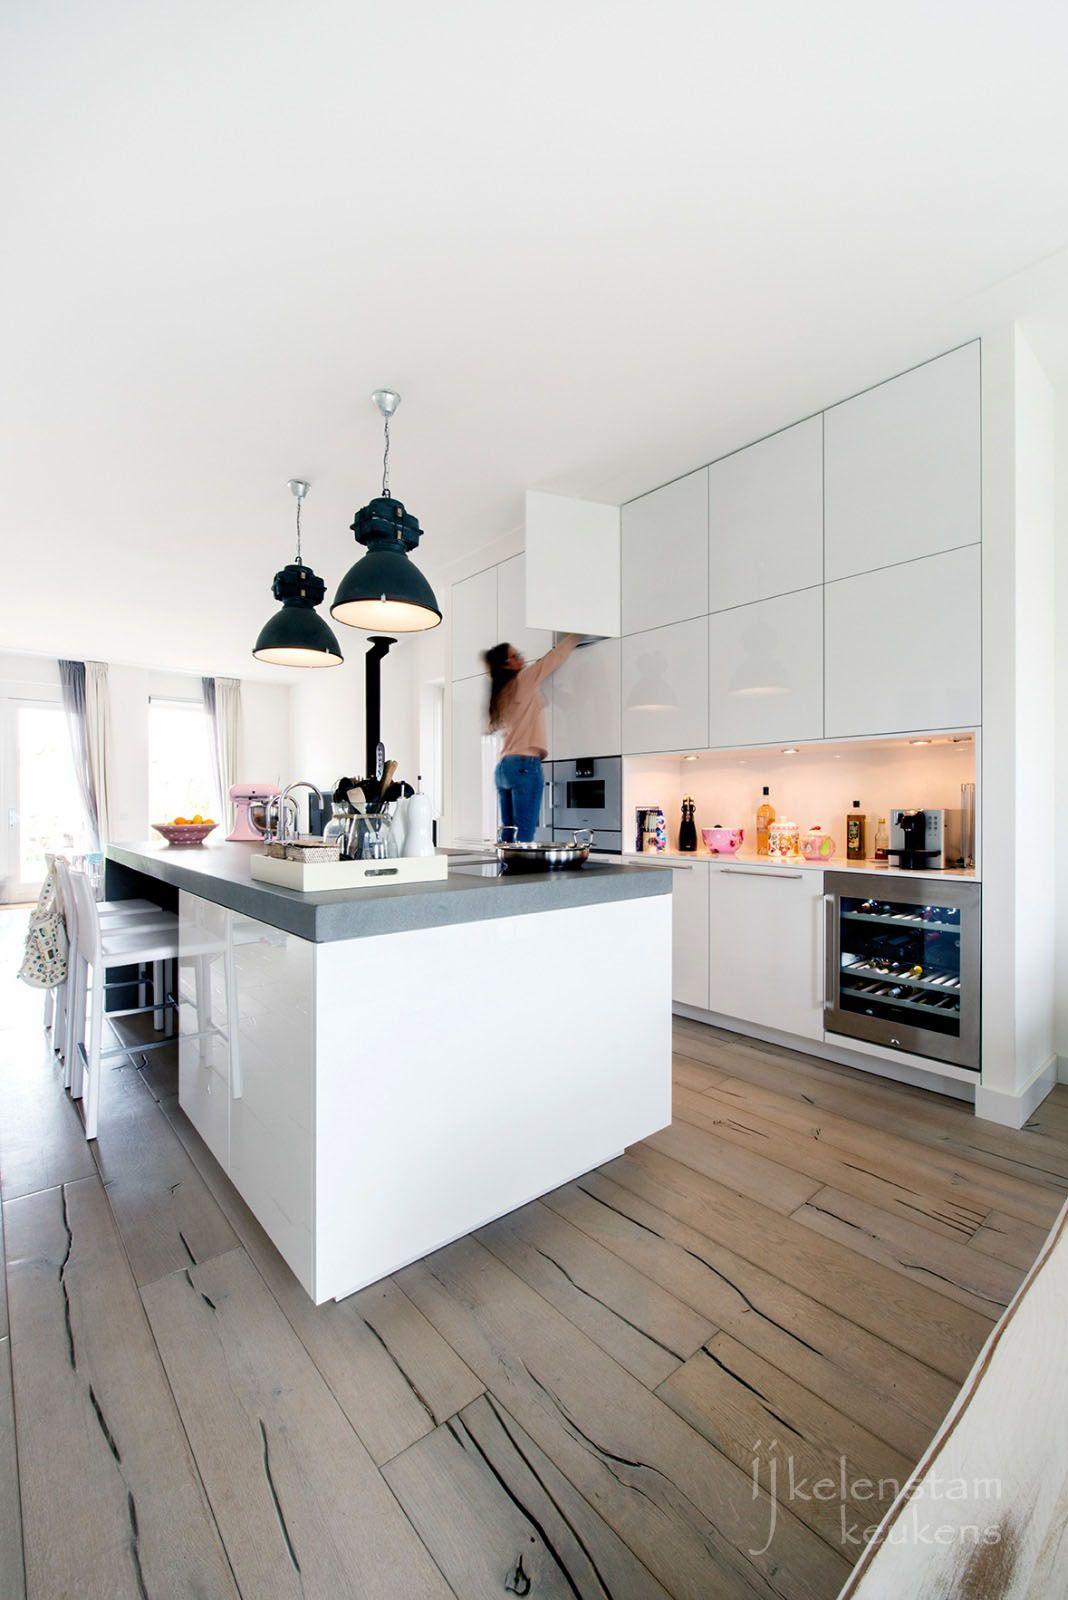 Poggenphol kitchen ijkelenstam keukens kitchen inspo pinterest